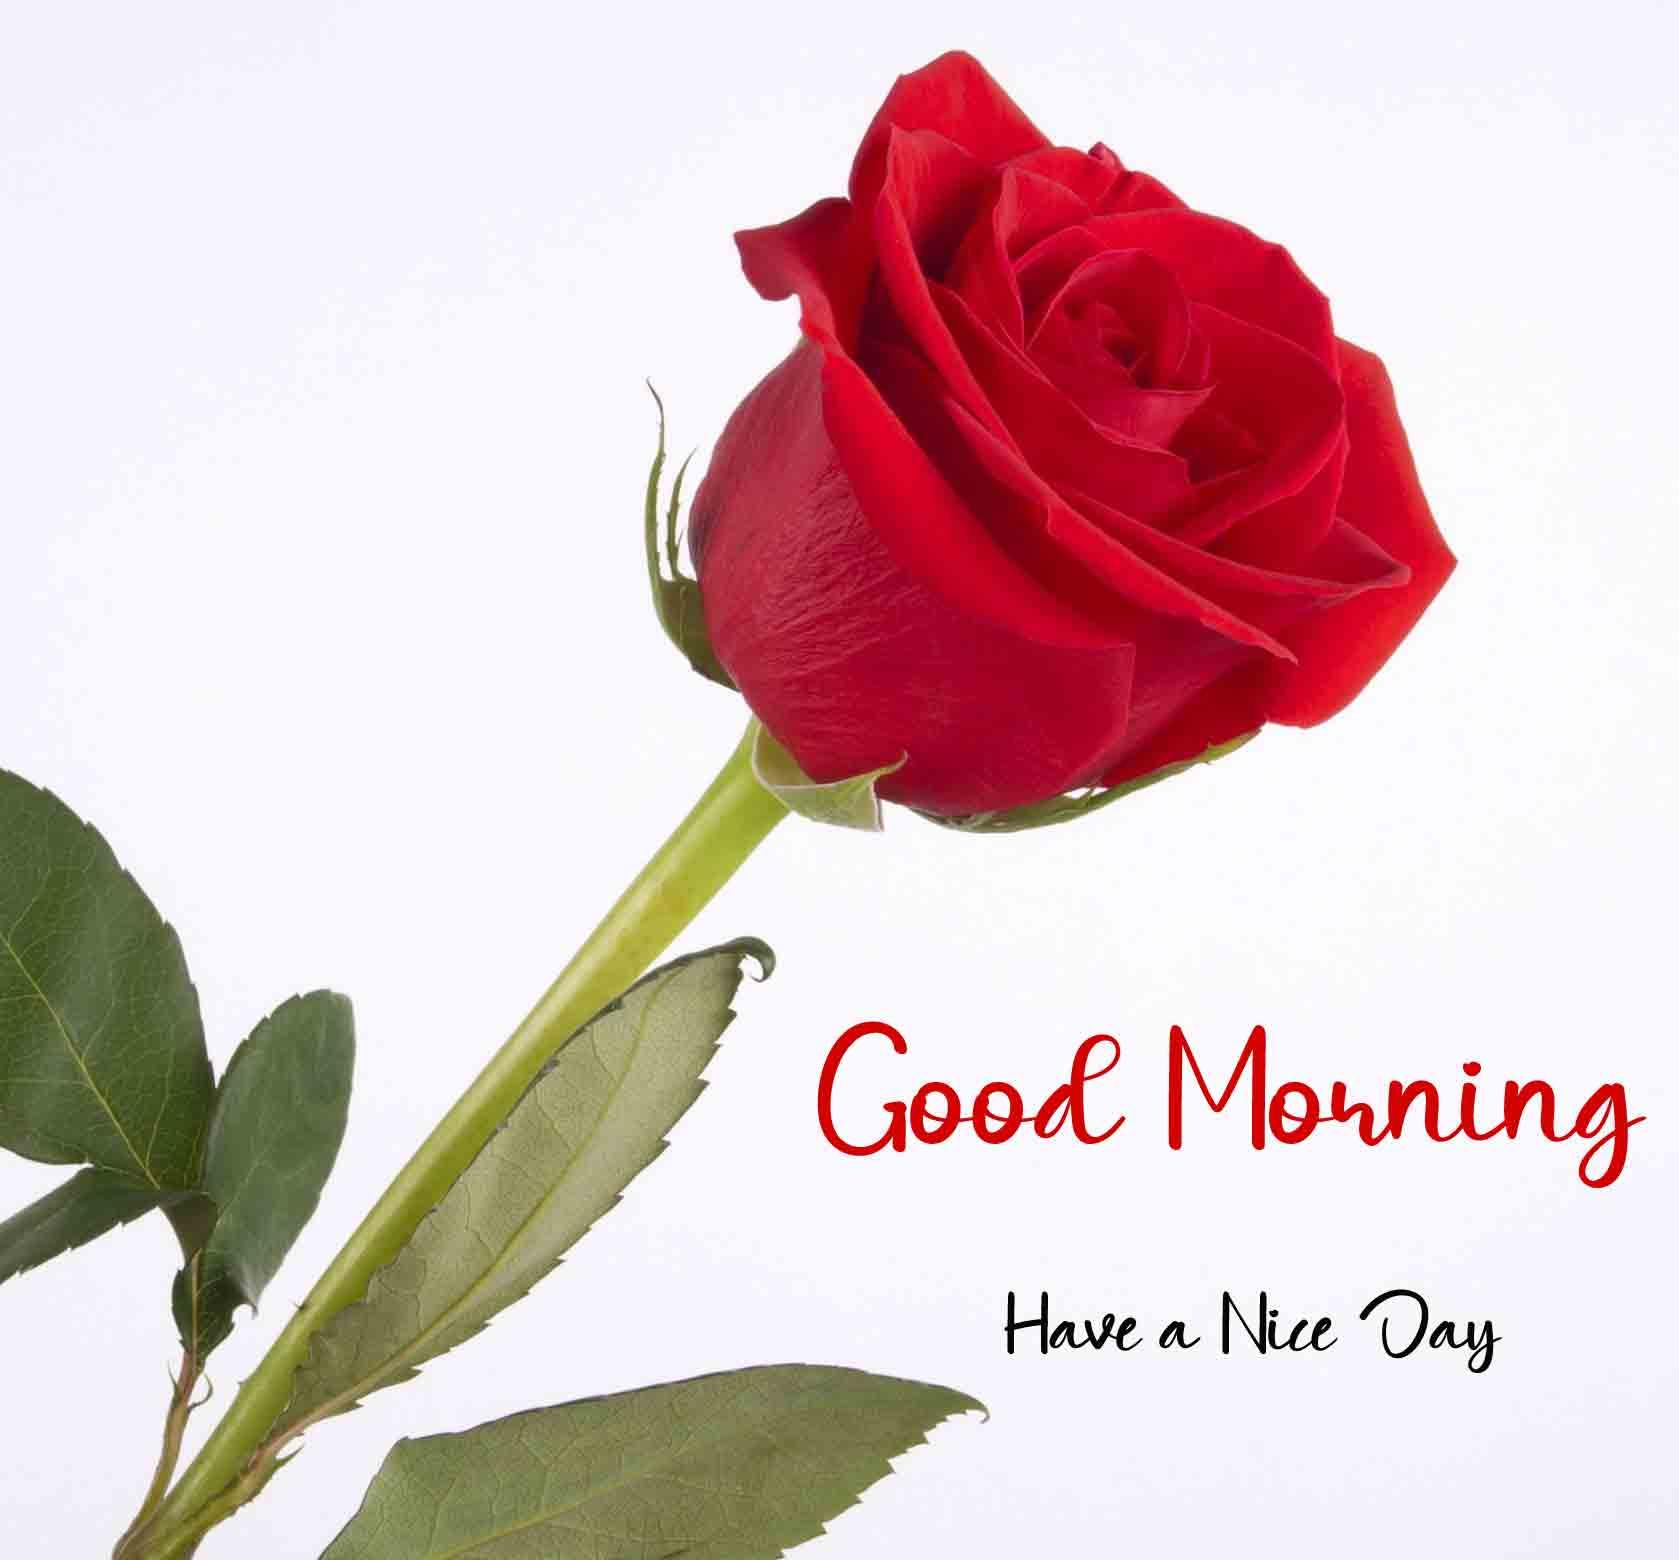 Good Morning DearP Photo